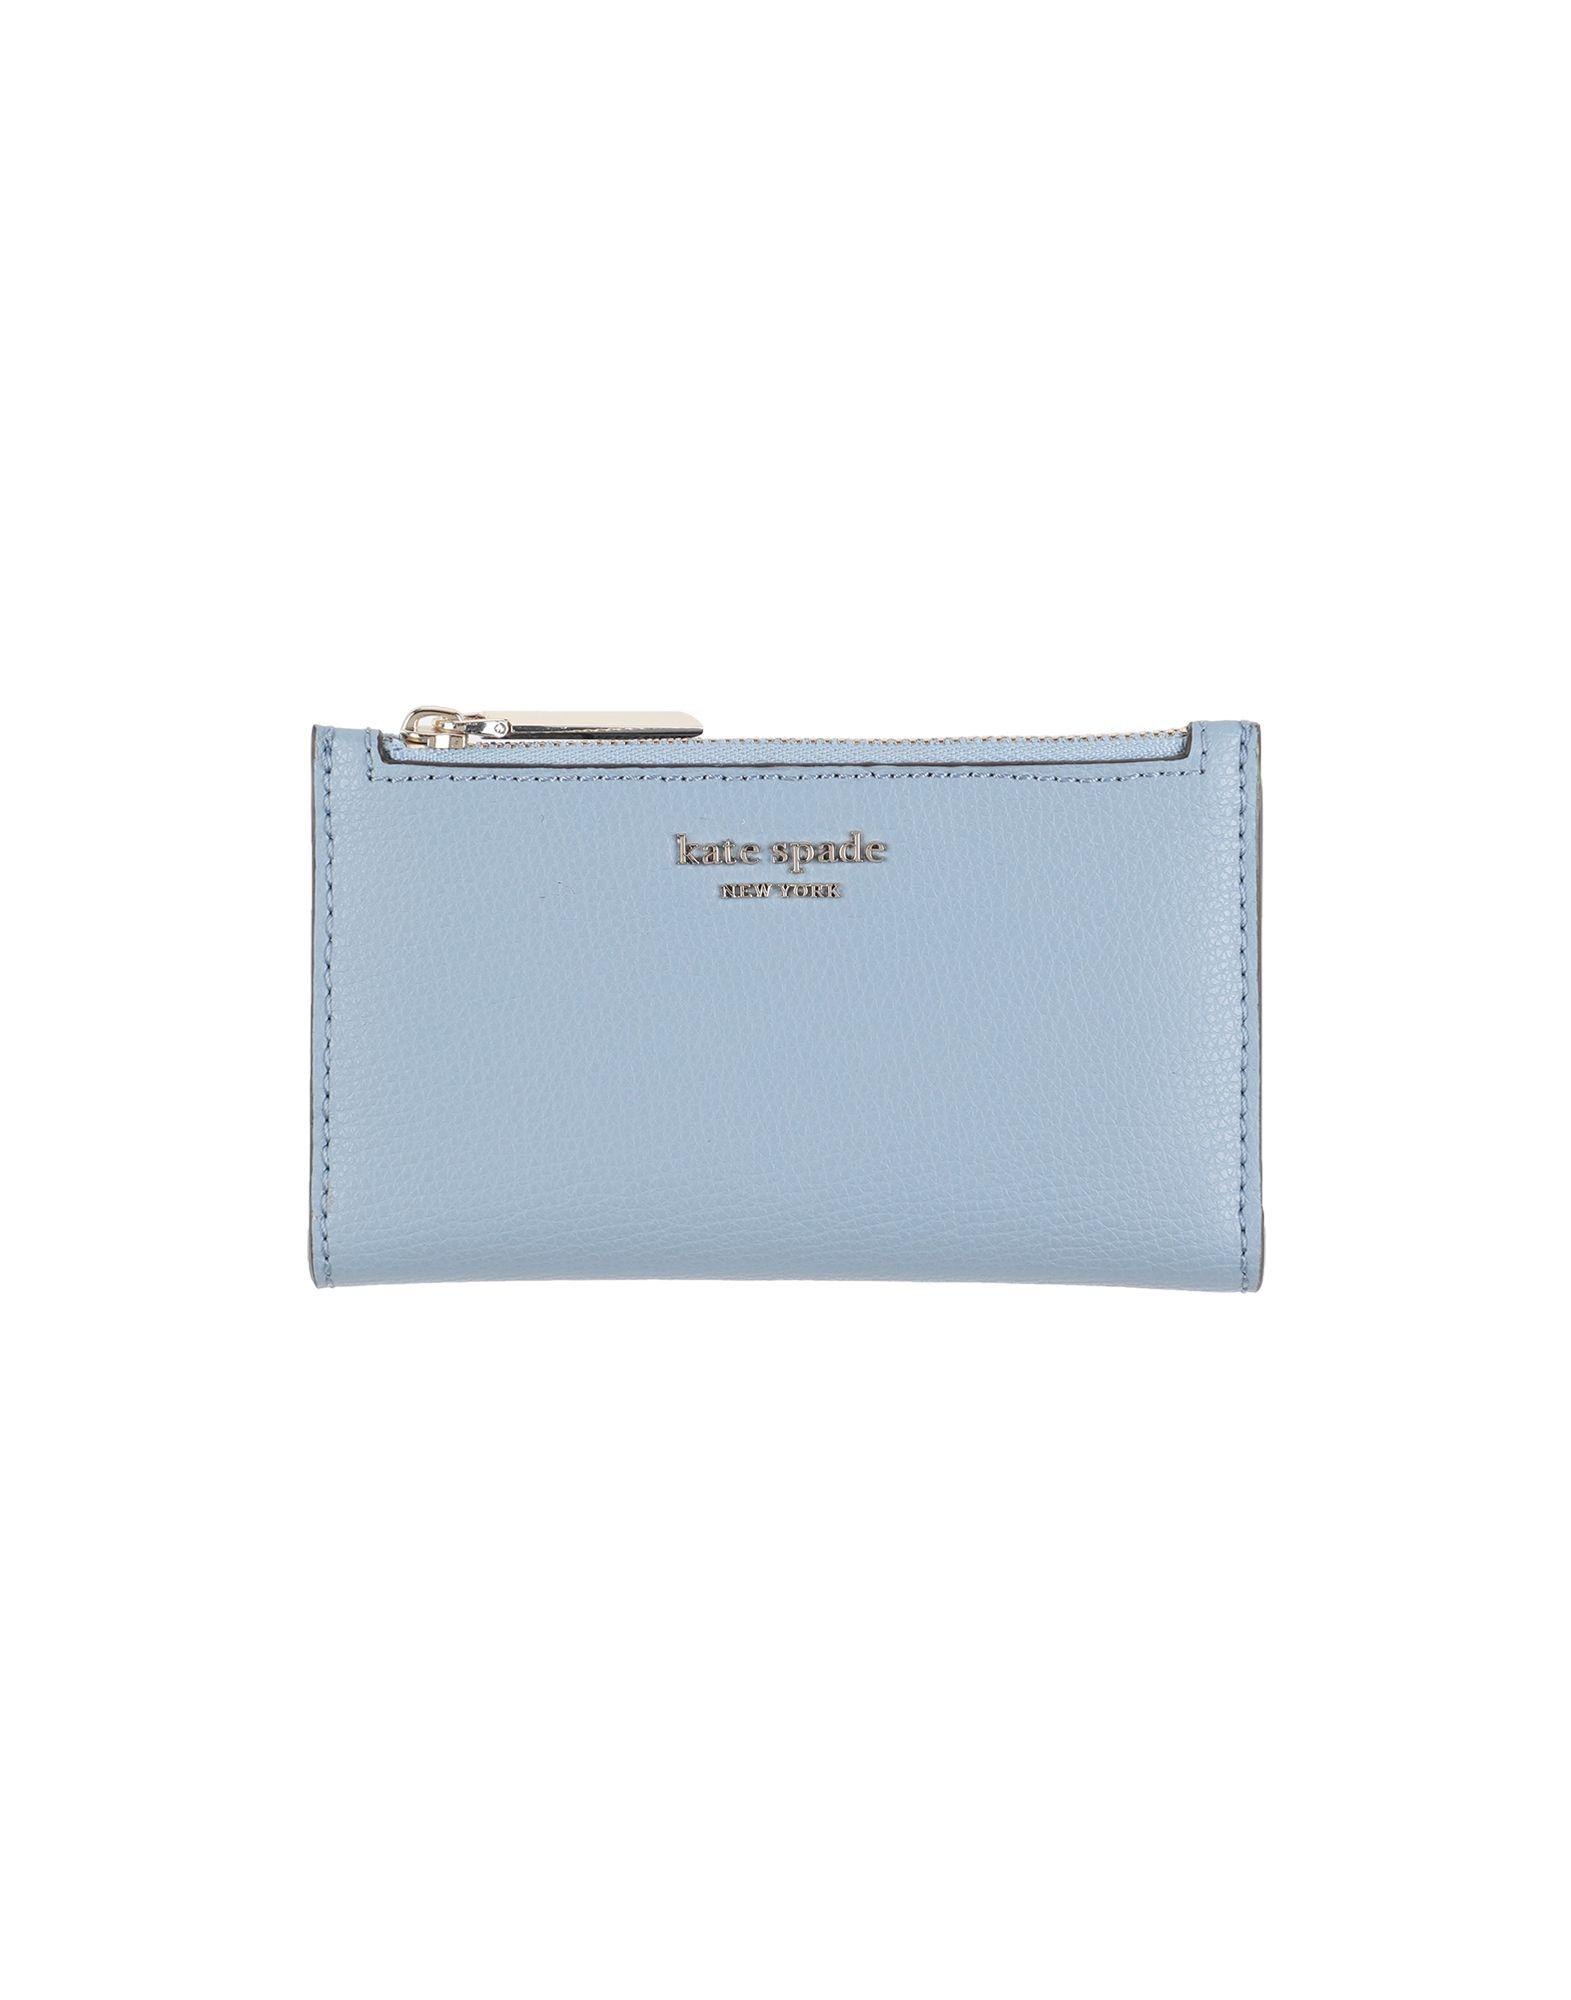 KATE SPADE New York Бумажник new wallet бумажник brain